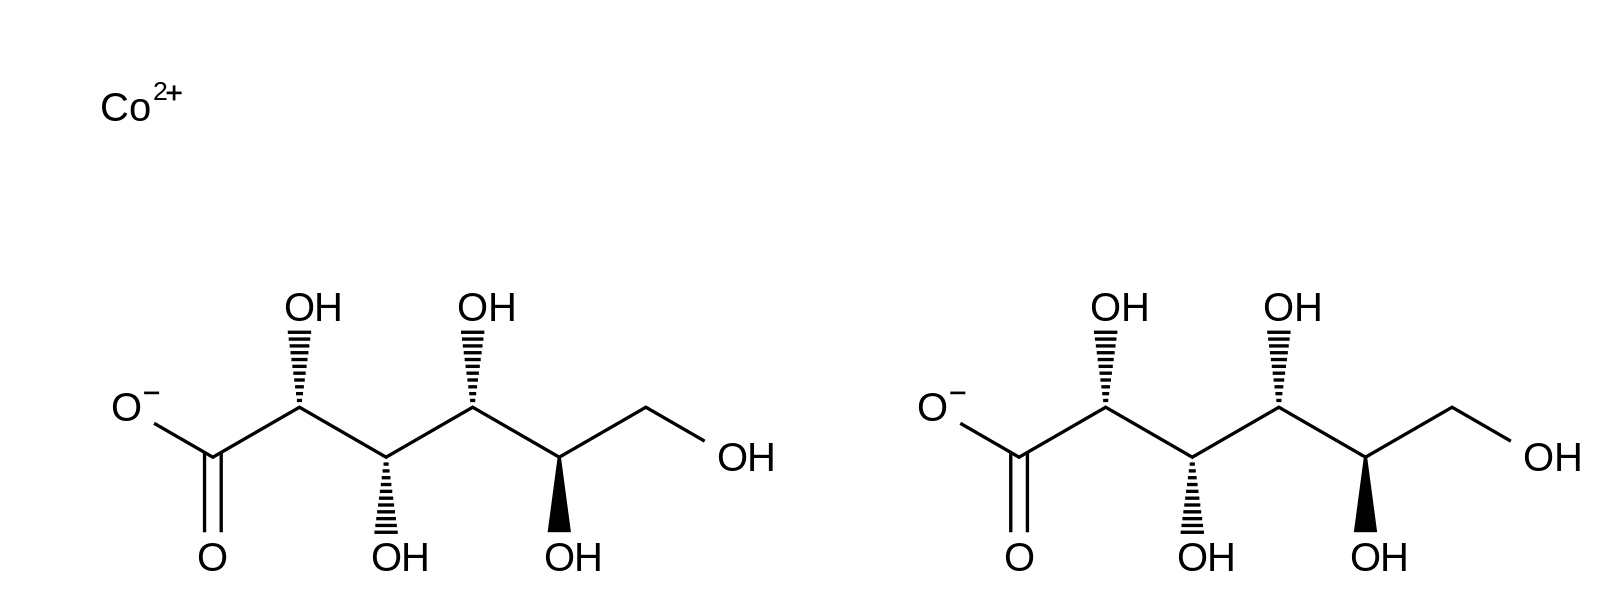 Cobalt(II) Gluconate Hydrate